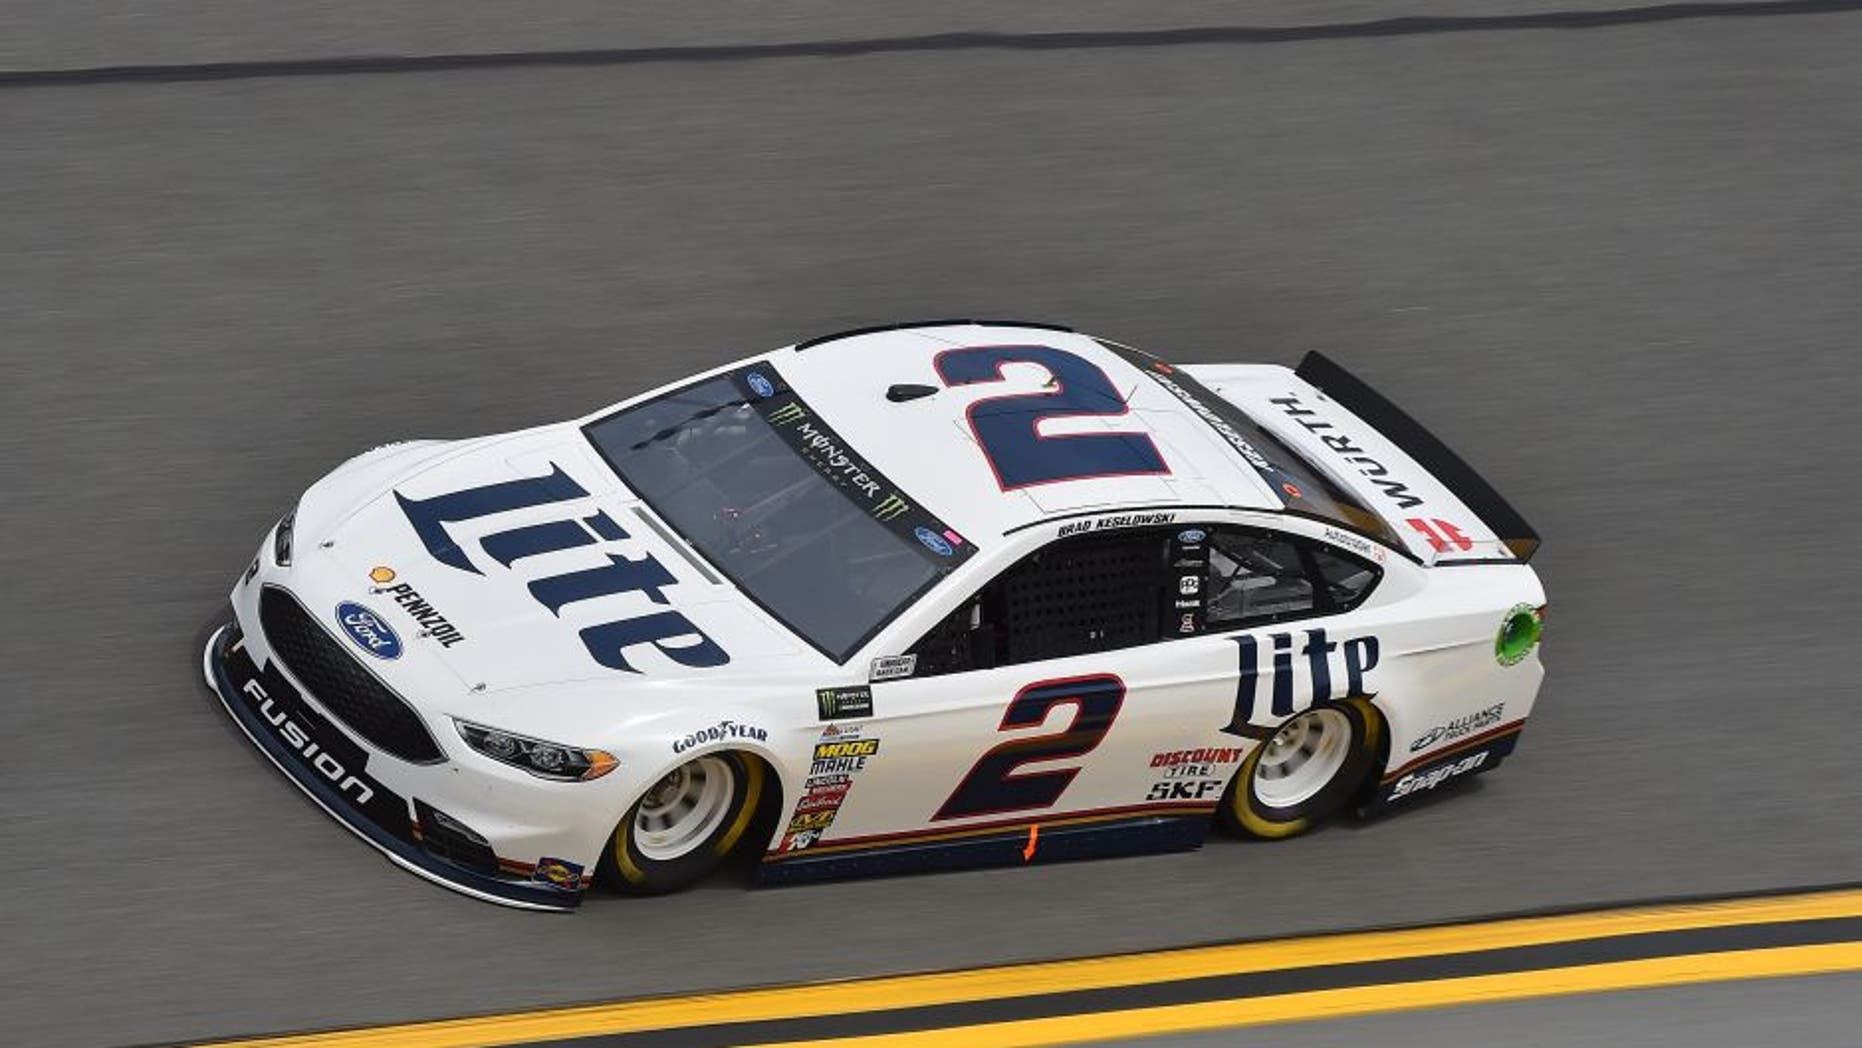 Feb 18, 2017; Daytona Beach, FL, USA; NASCAR Cup Series driver Brad Keselowski (2) during practice for the Daytona 500 at Daytona International Speedway. Mandatory Credit: Jasen Vinlove-USA TODAY Sports